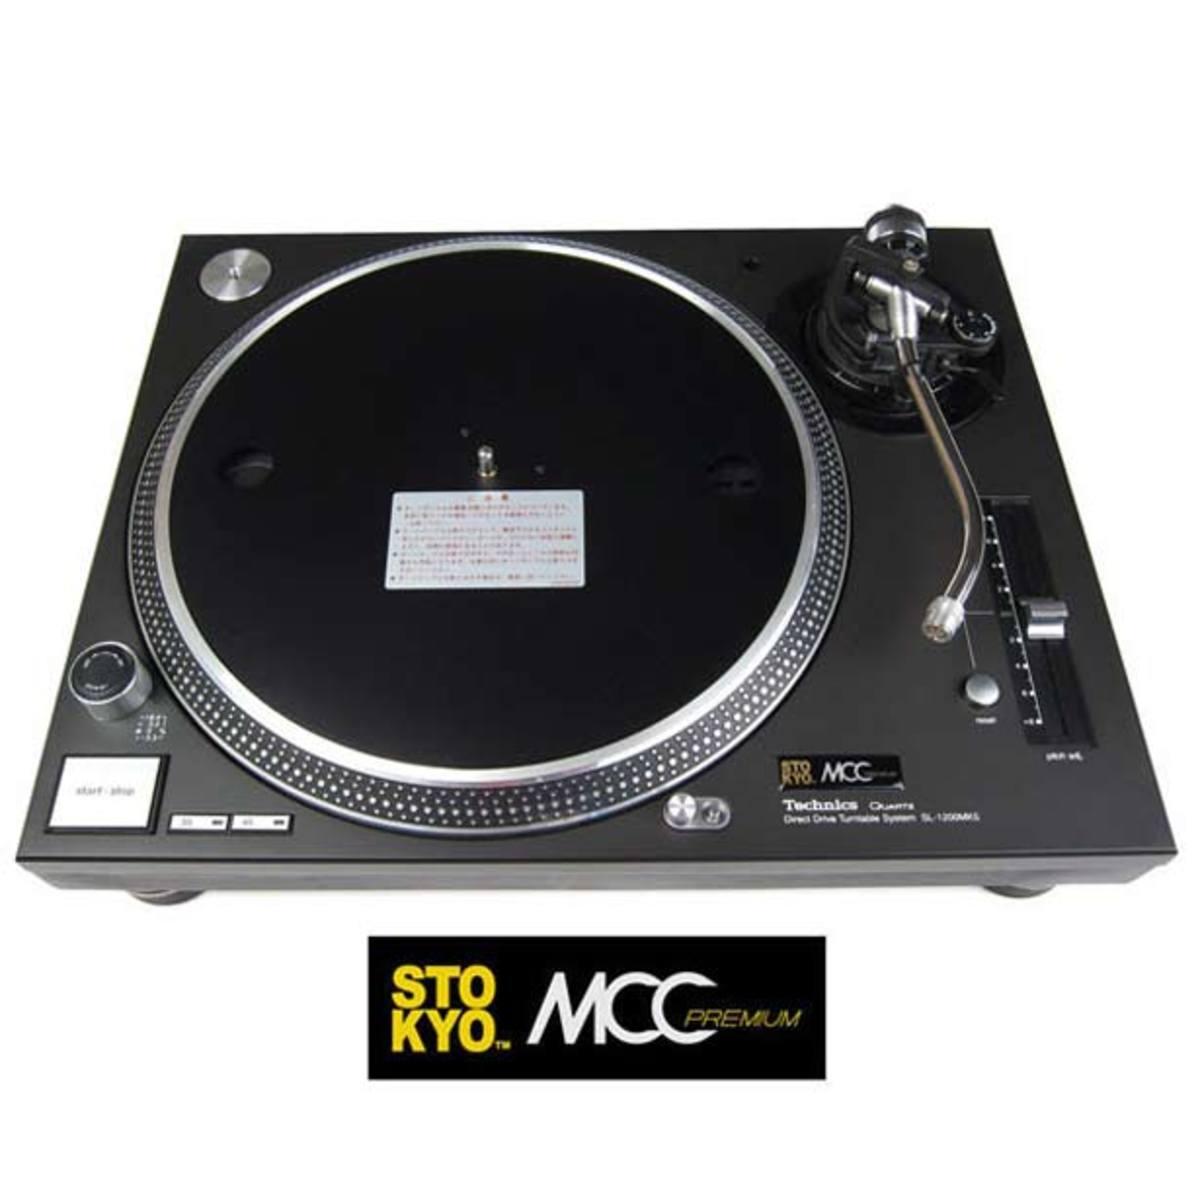 DJ Gear: Technics 1210 Stokyo MCC Refurbished Turntable